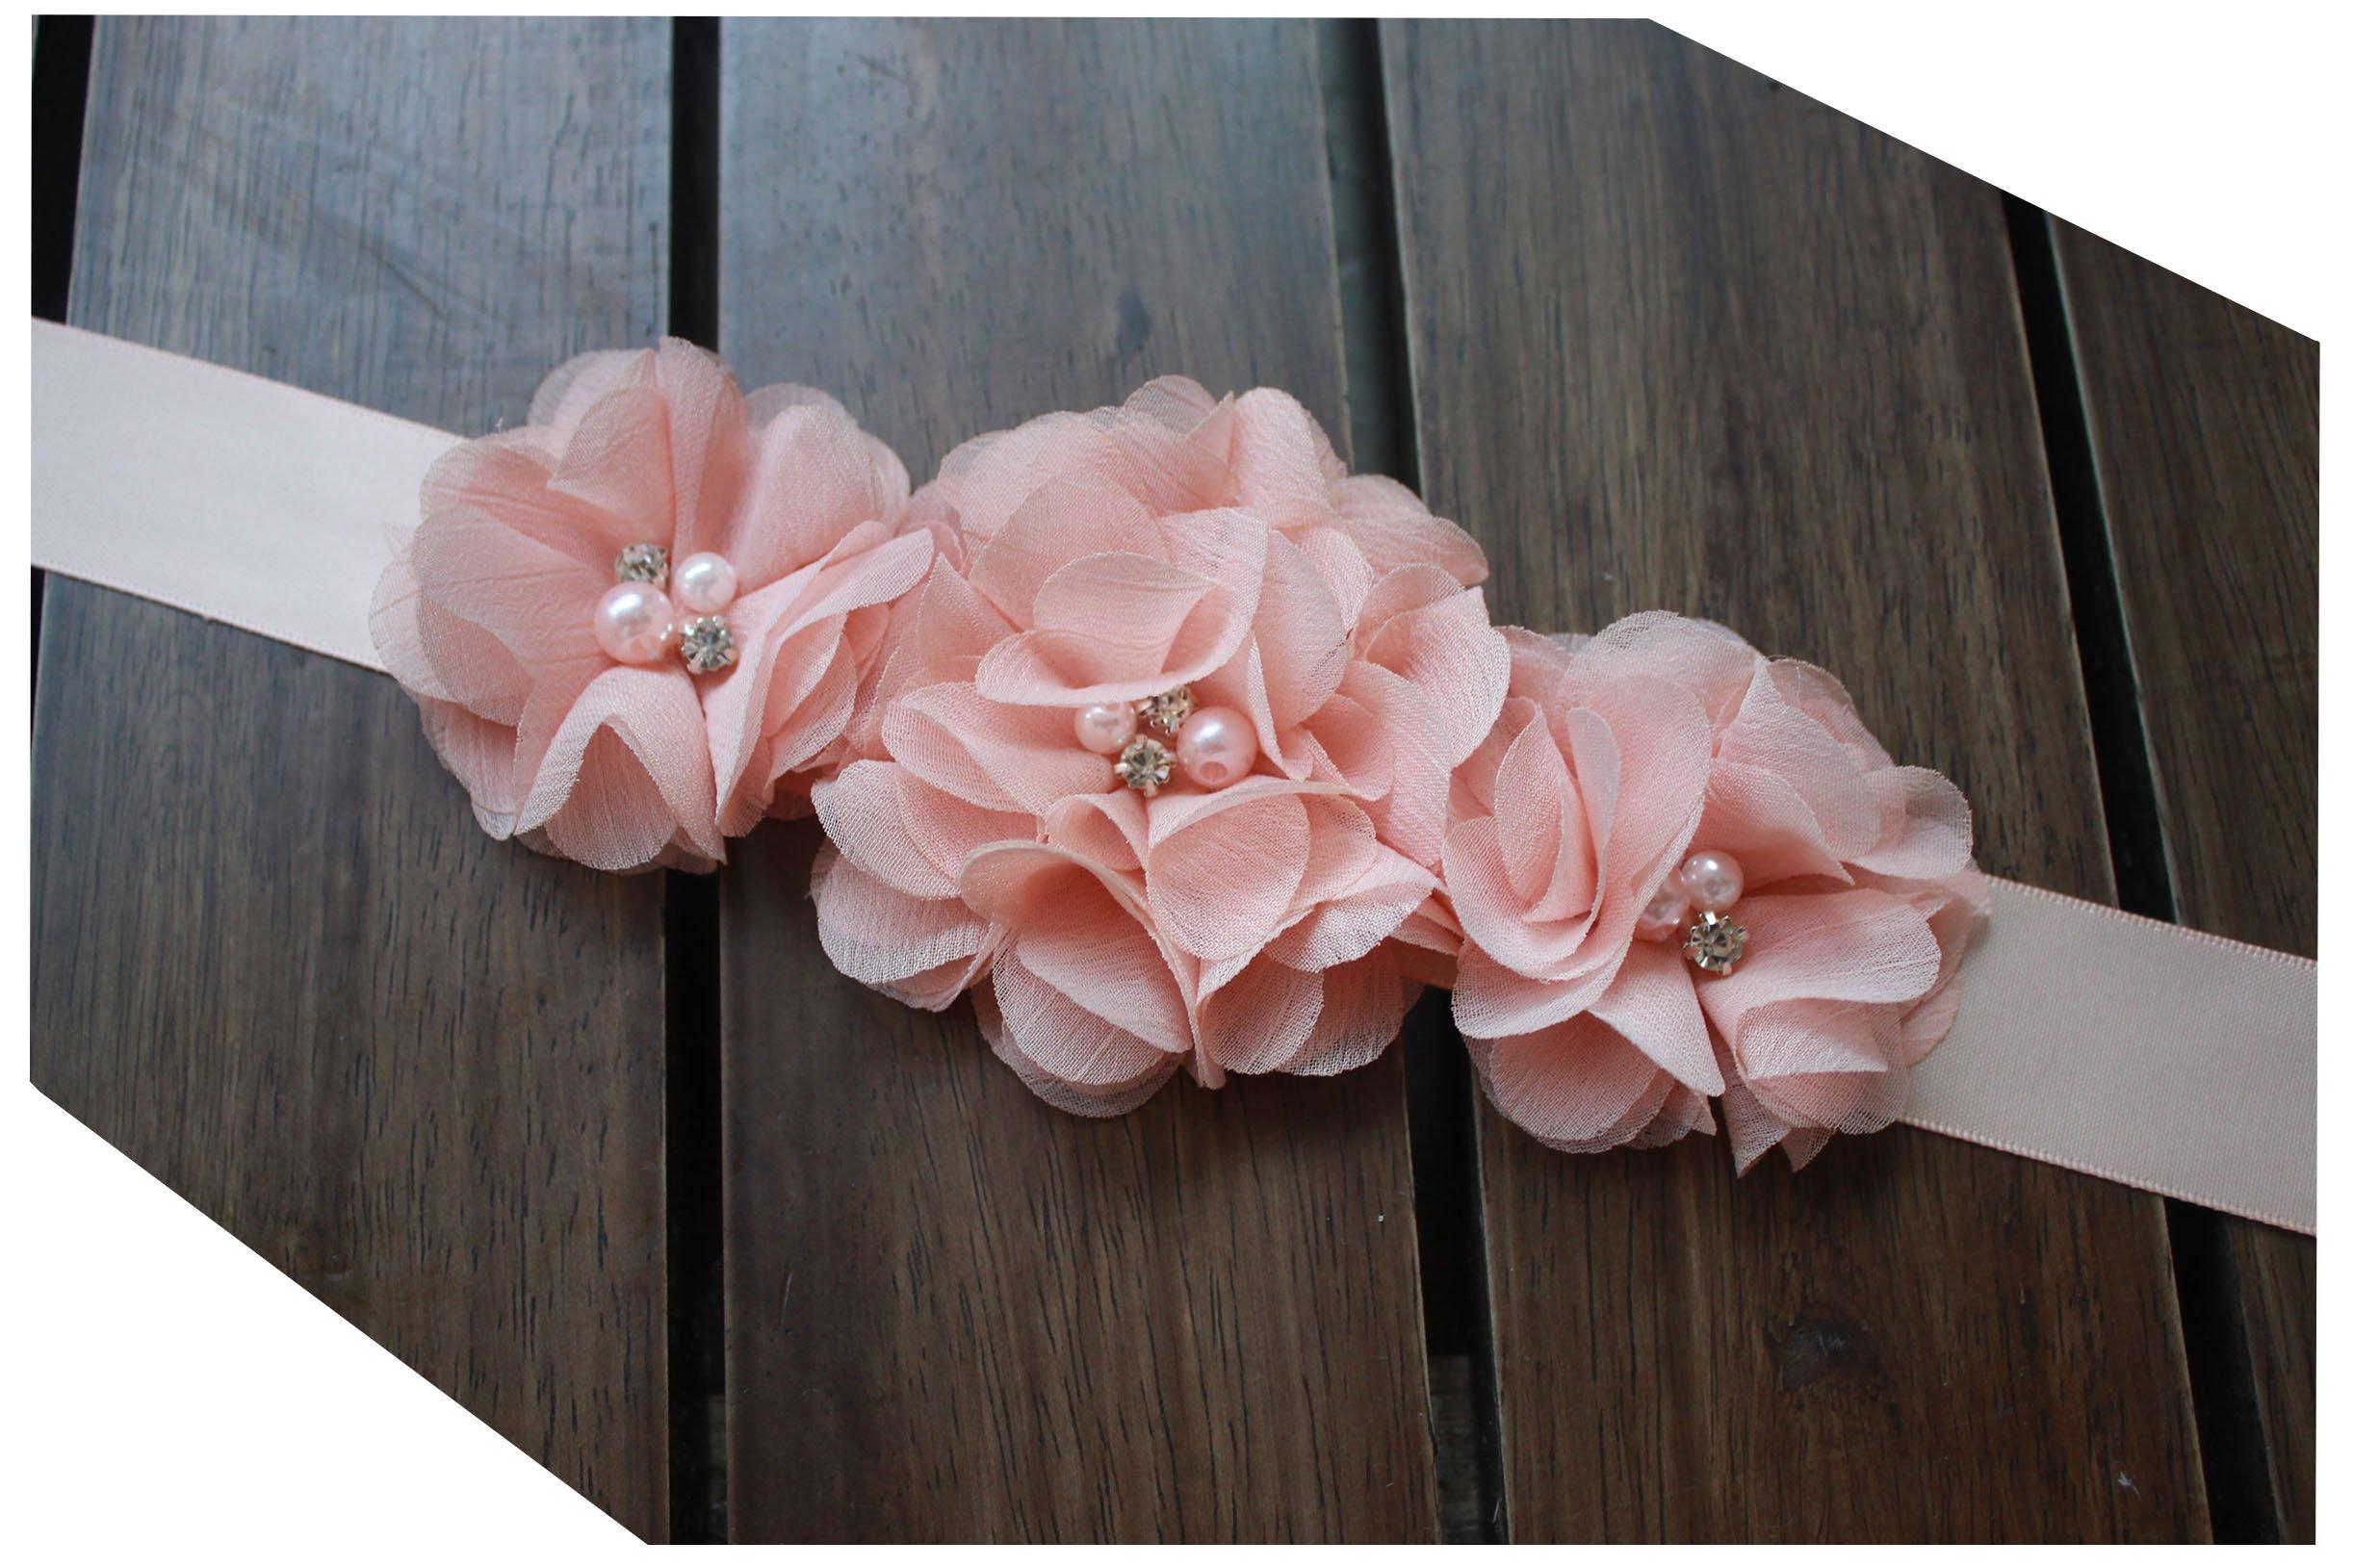 Bridesmaid and Flowergirls sashes wedding sash pearls flowers belts (Peach)